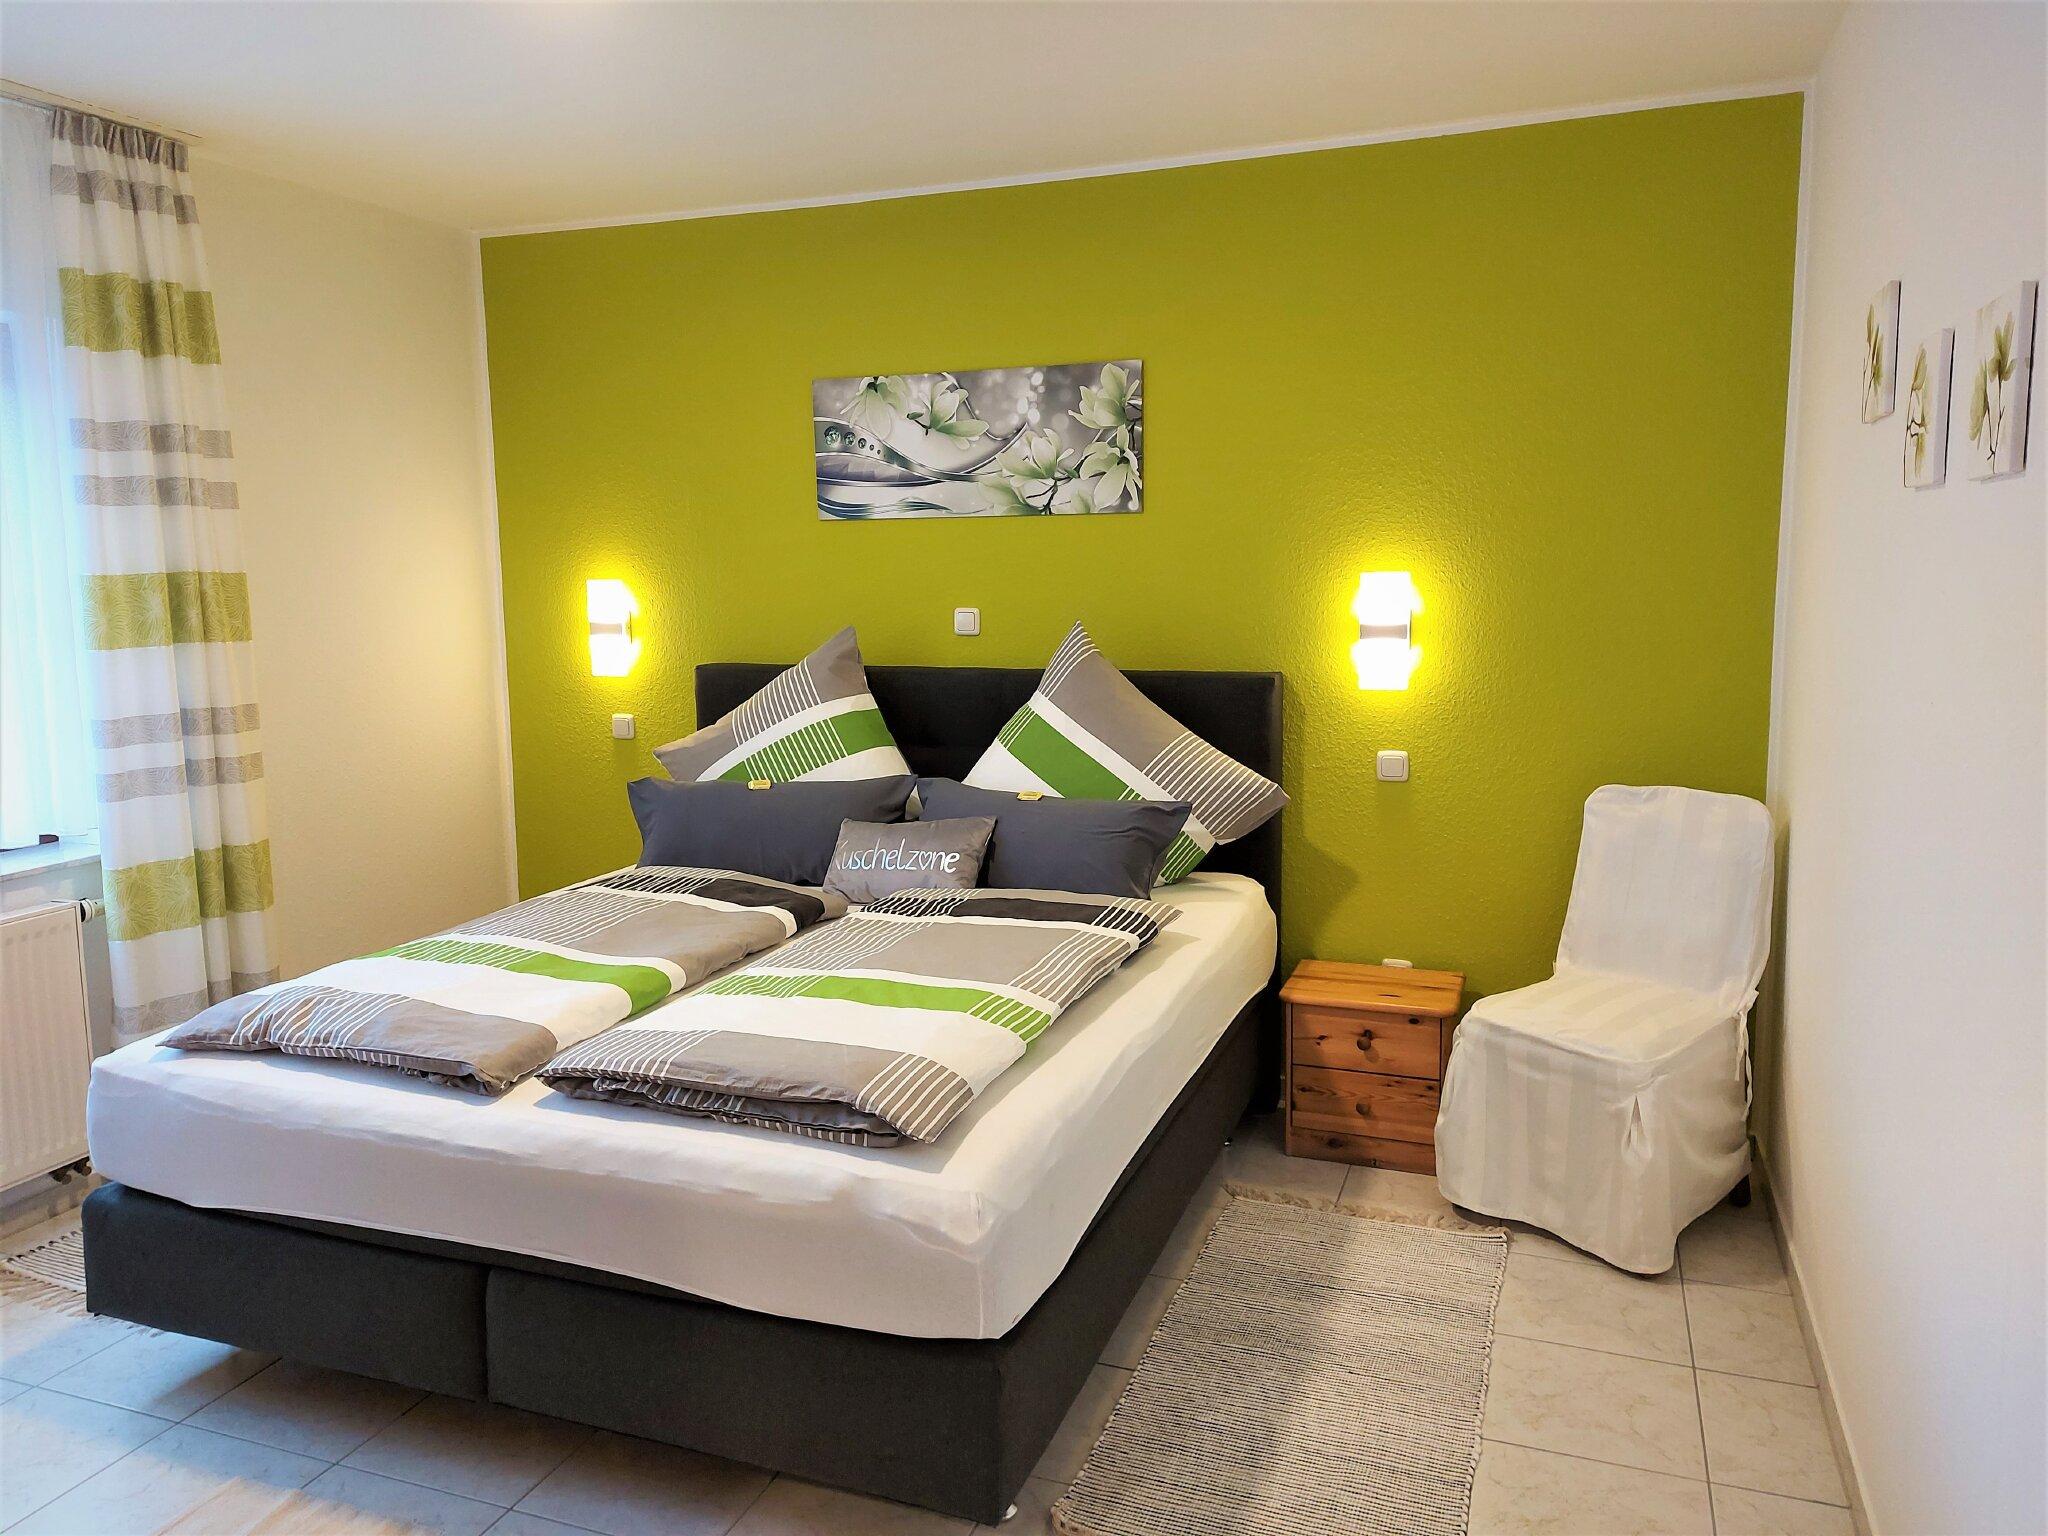 Schlafzimmer EG. rollstuhlgerecht